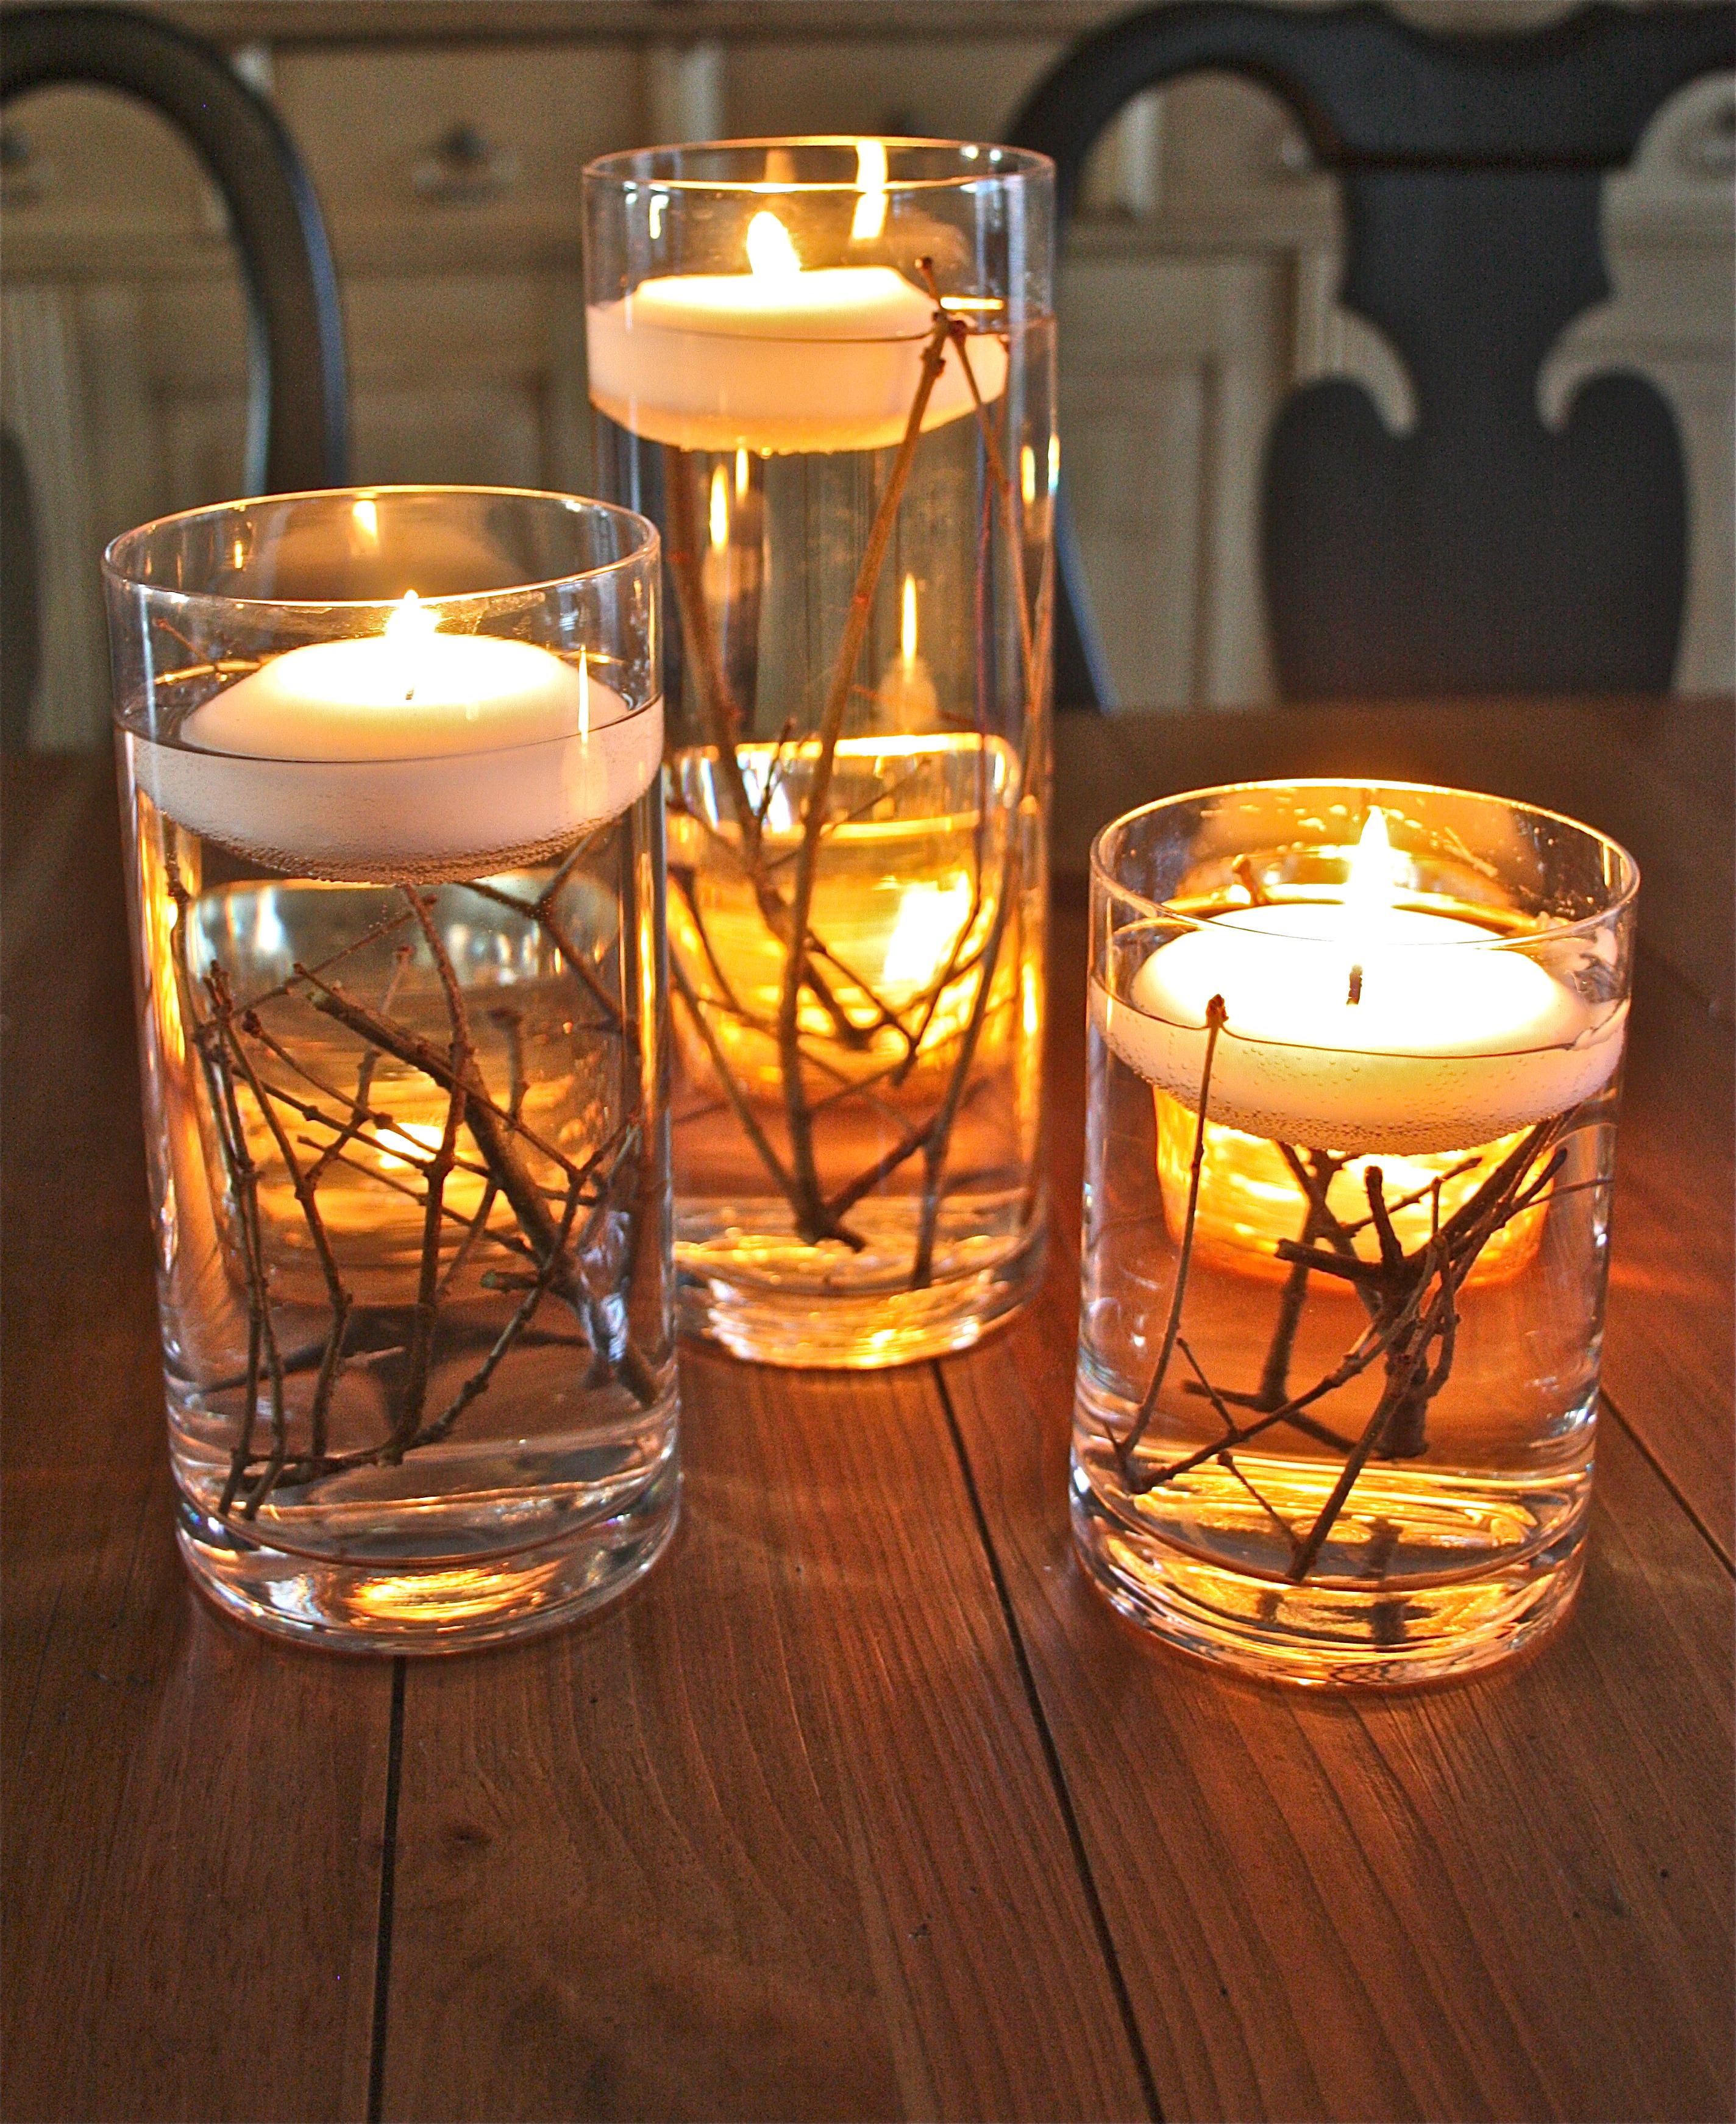 Mason Jar Crafts 30 Mason Jar Fall Crafts Autumn Diy Ideas With Mason Jars